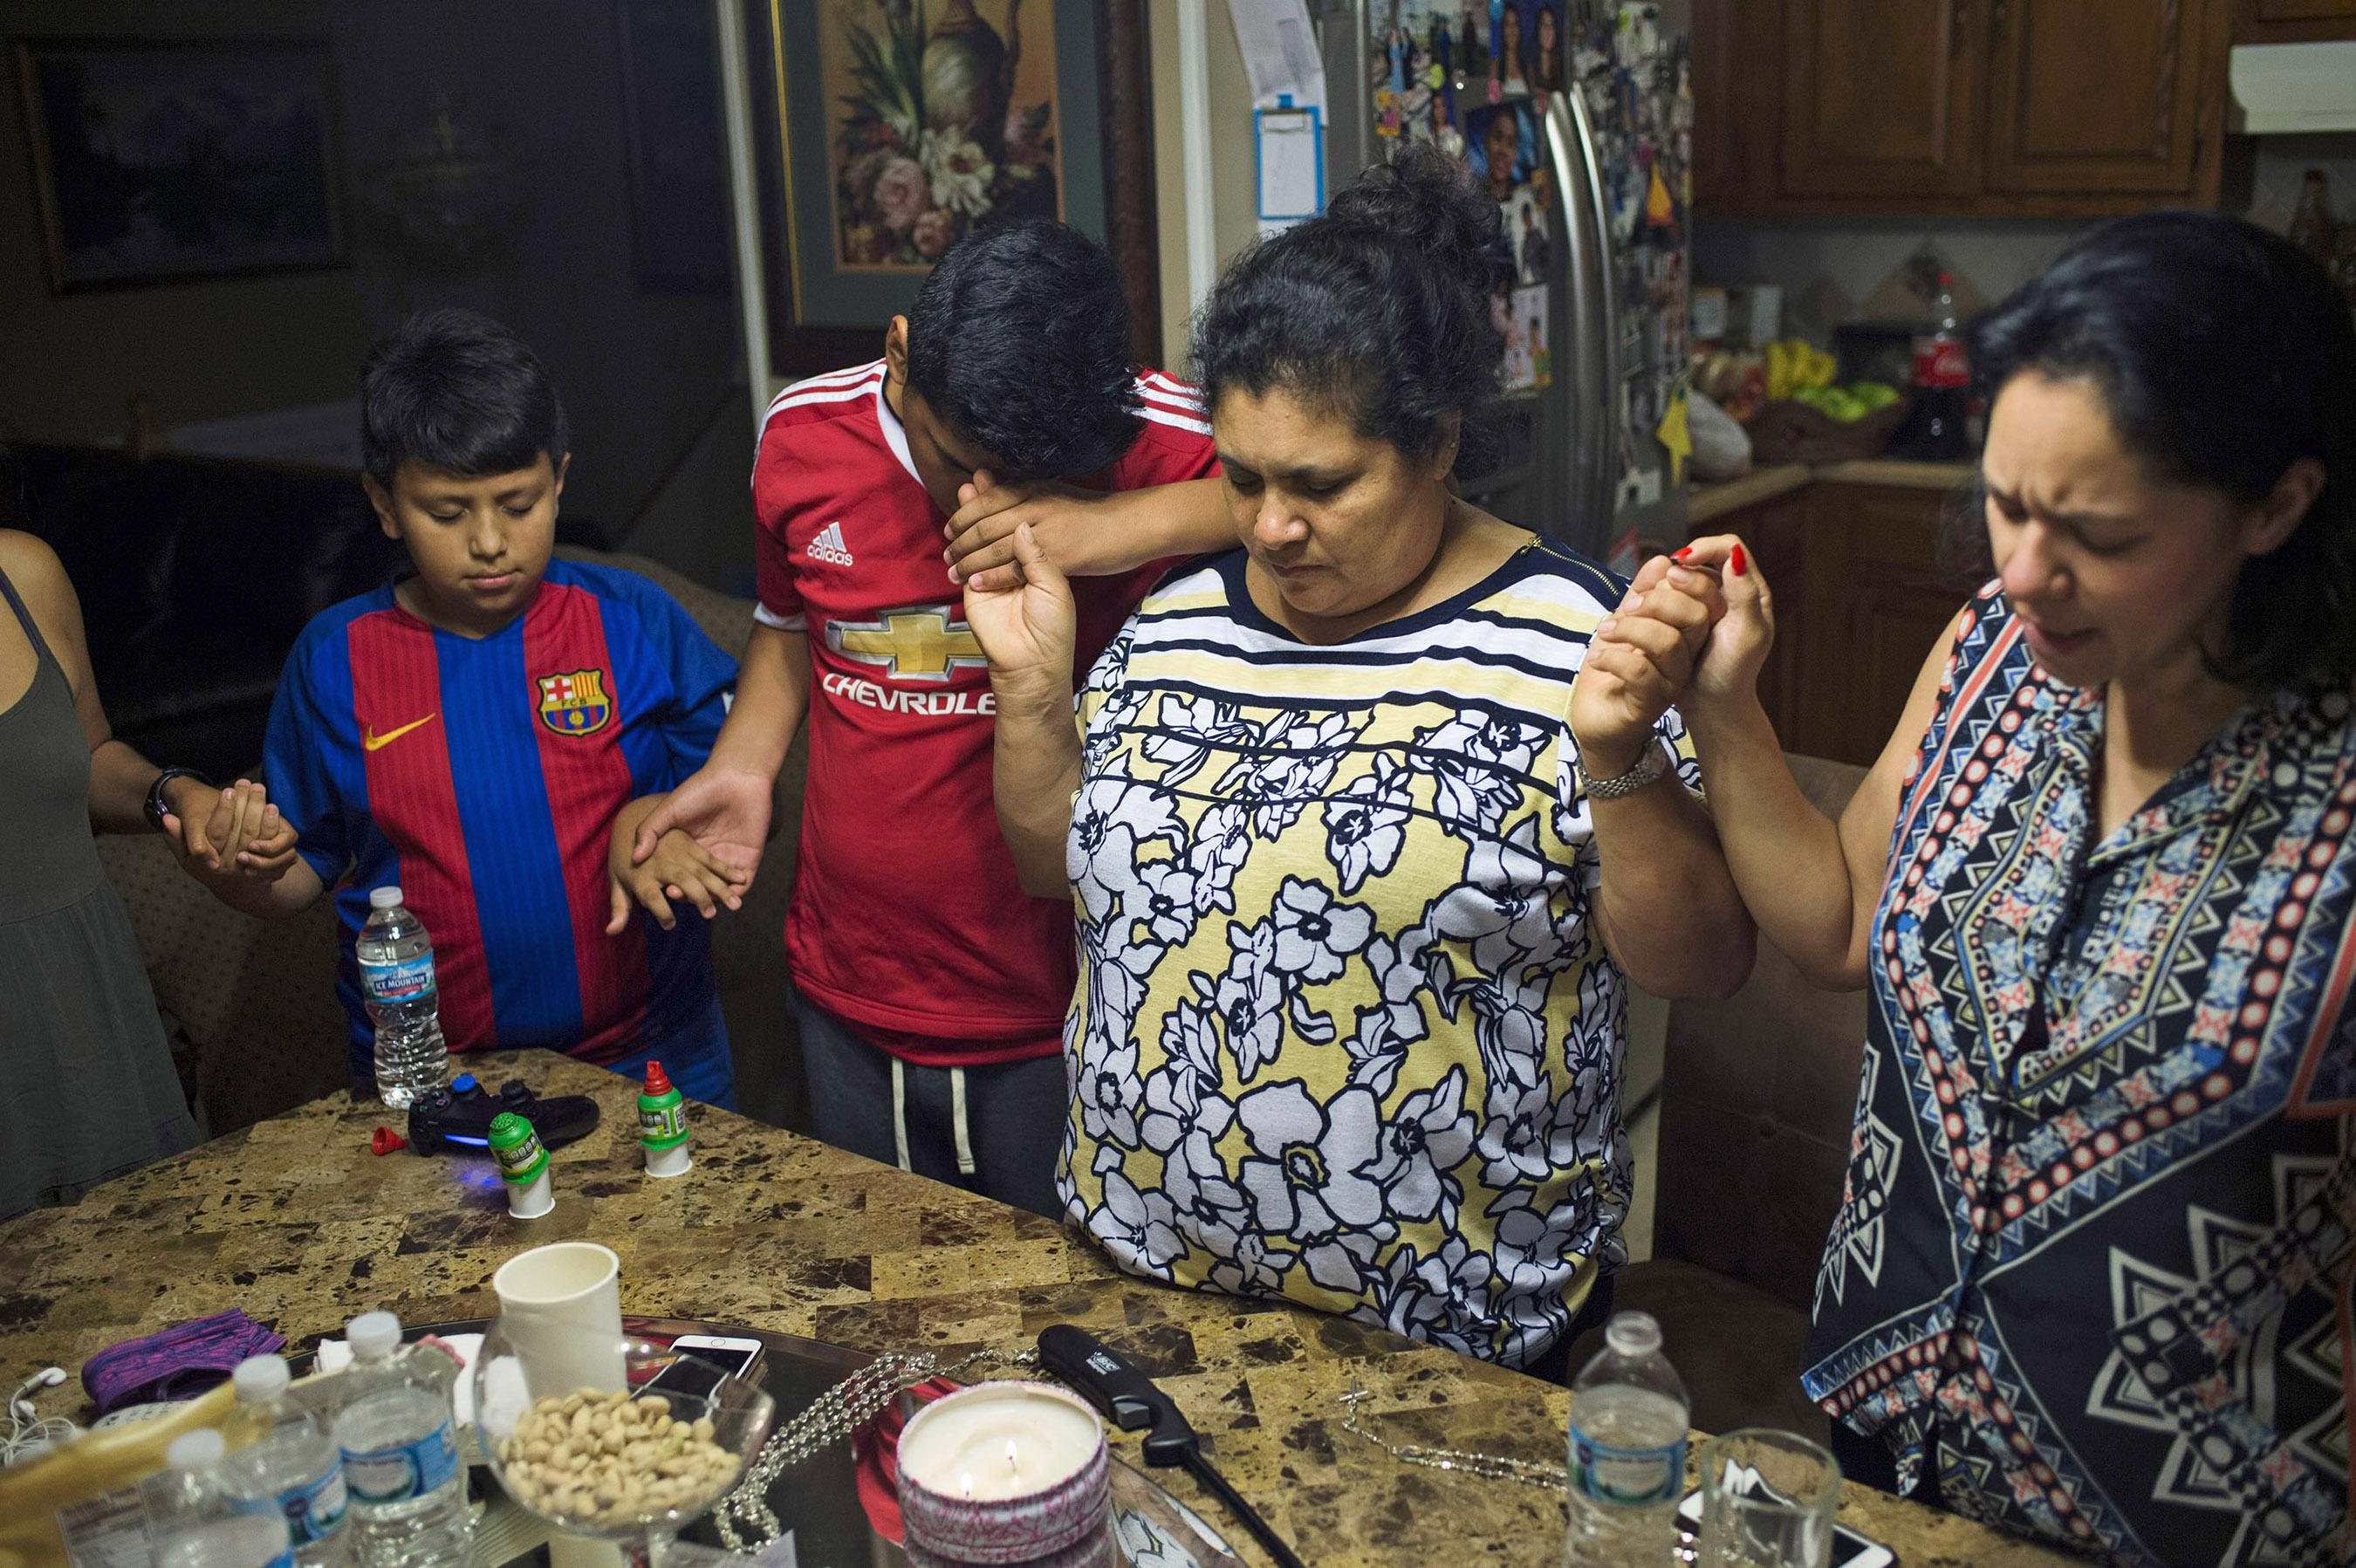 Wilmer Garcia, Bryan Quintana-Salazar, 13, Lourdes Salazar Bautista and Tania Garcia Ortega